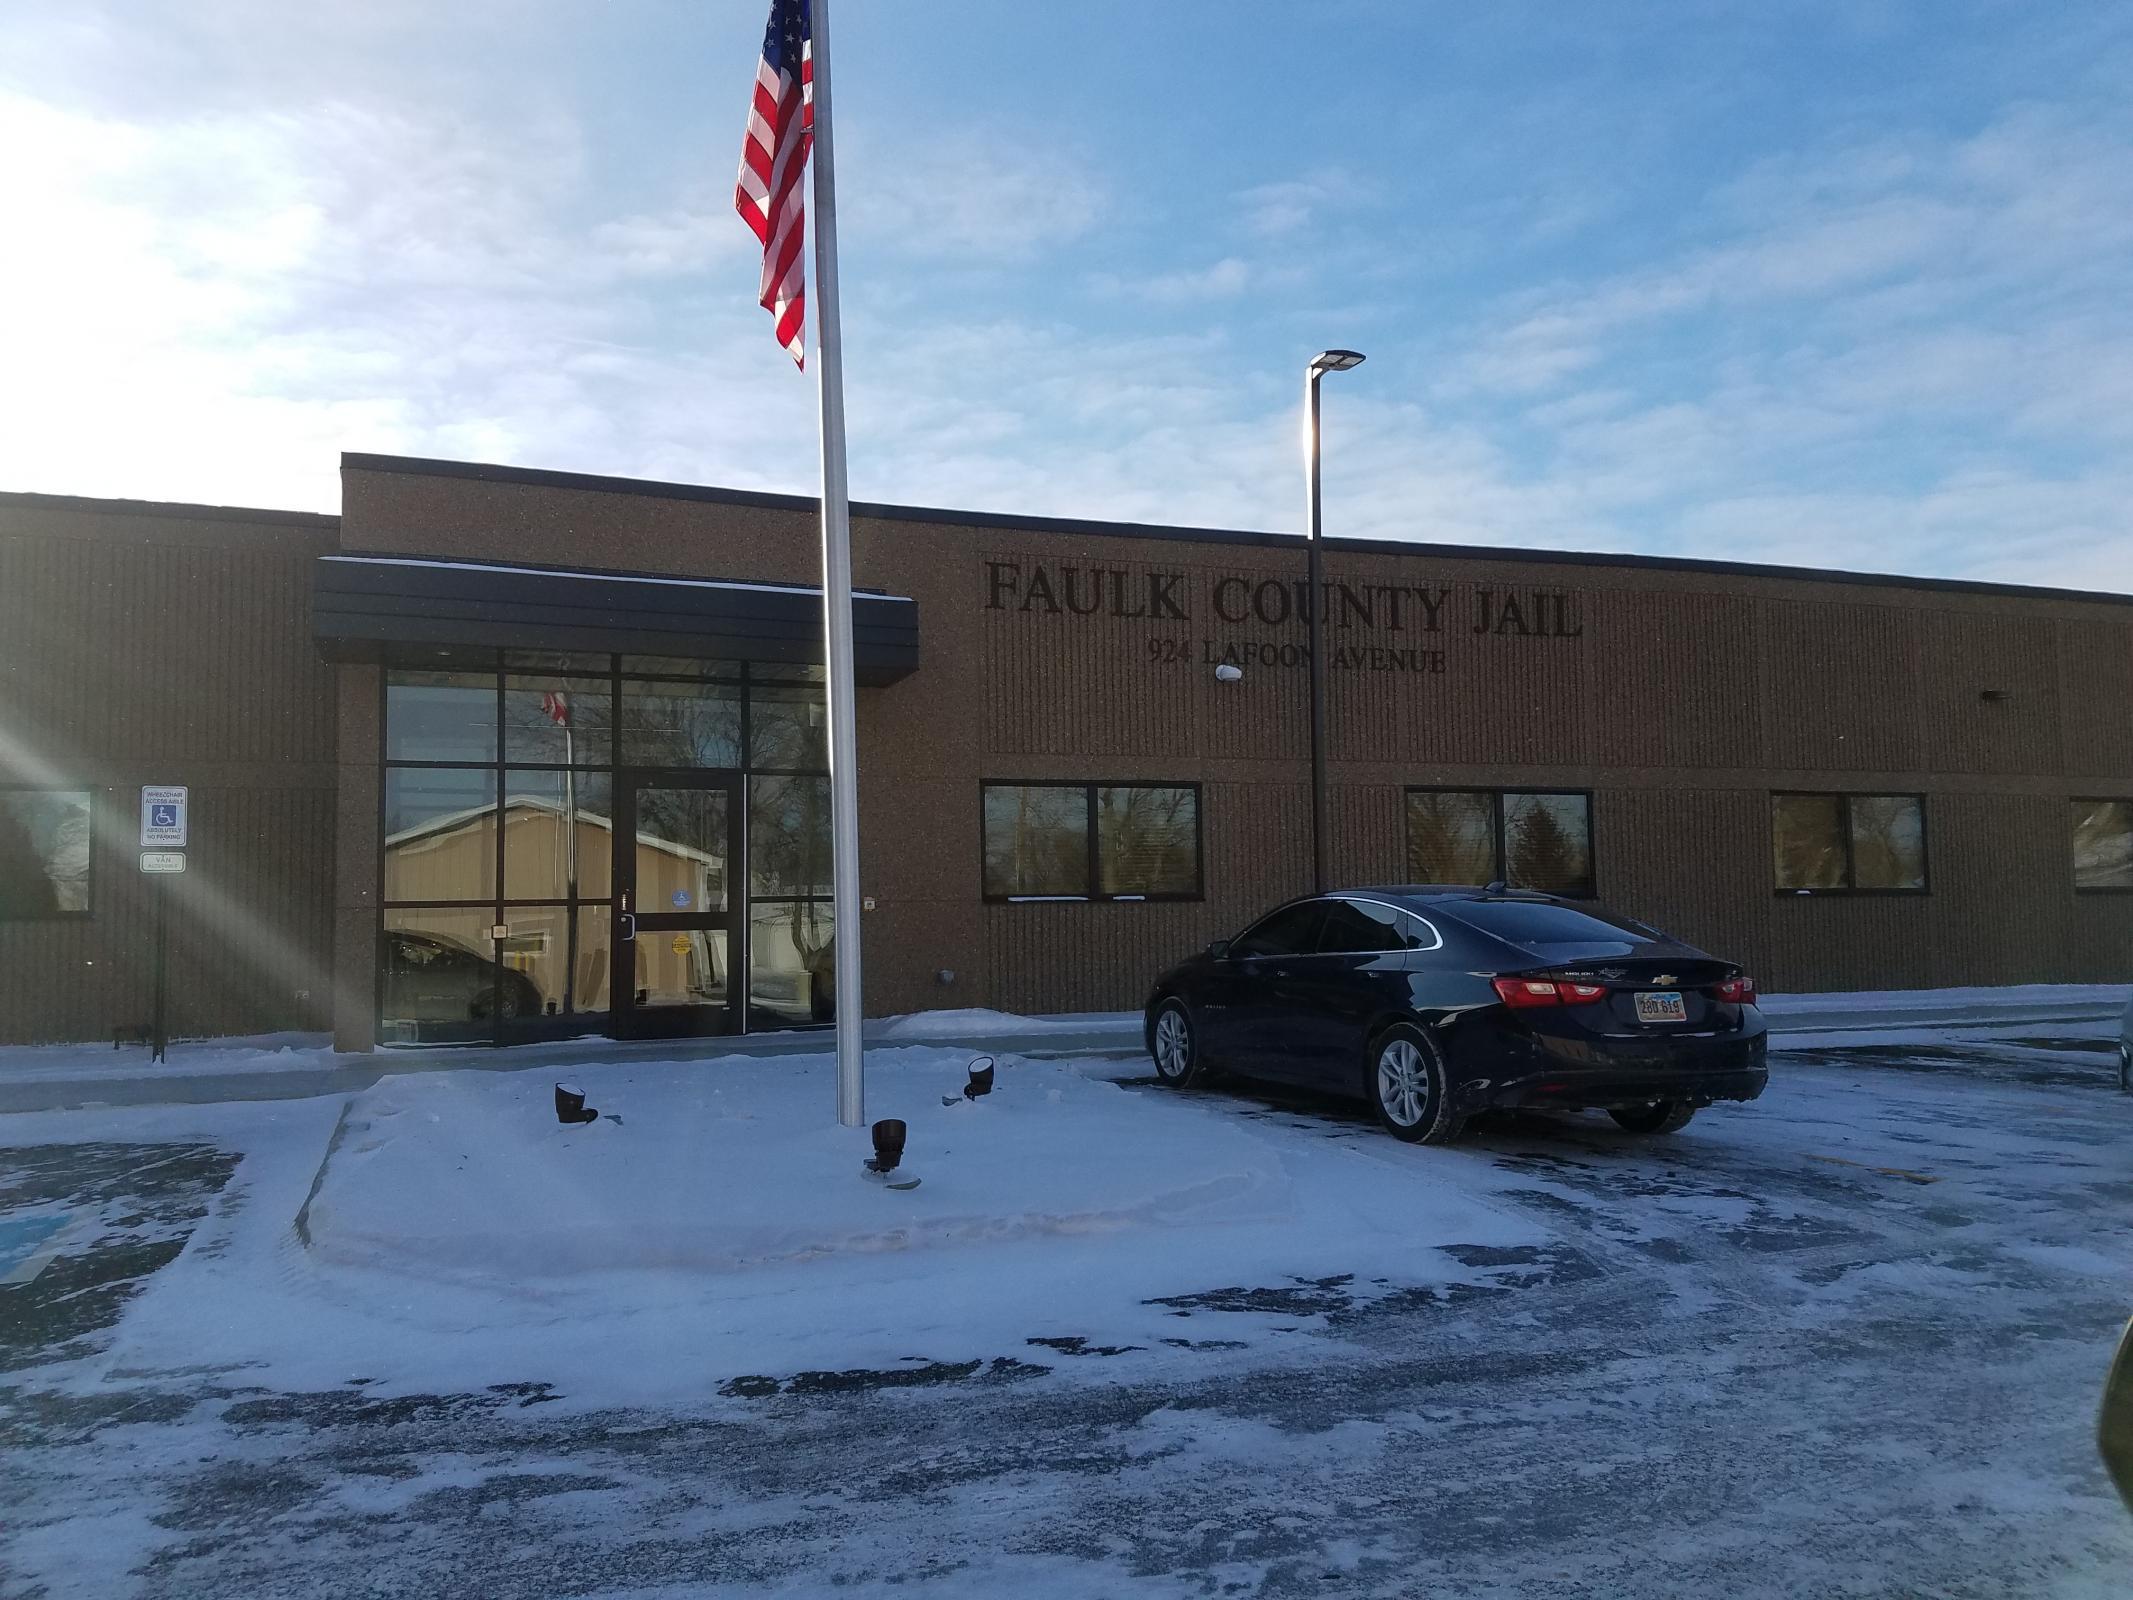 Faulk County Jail Photo